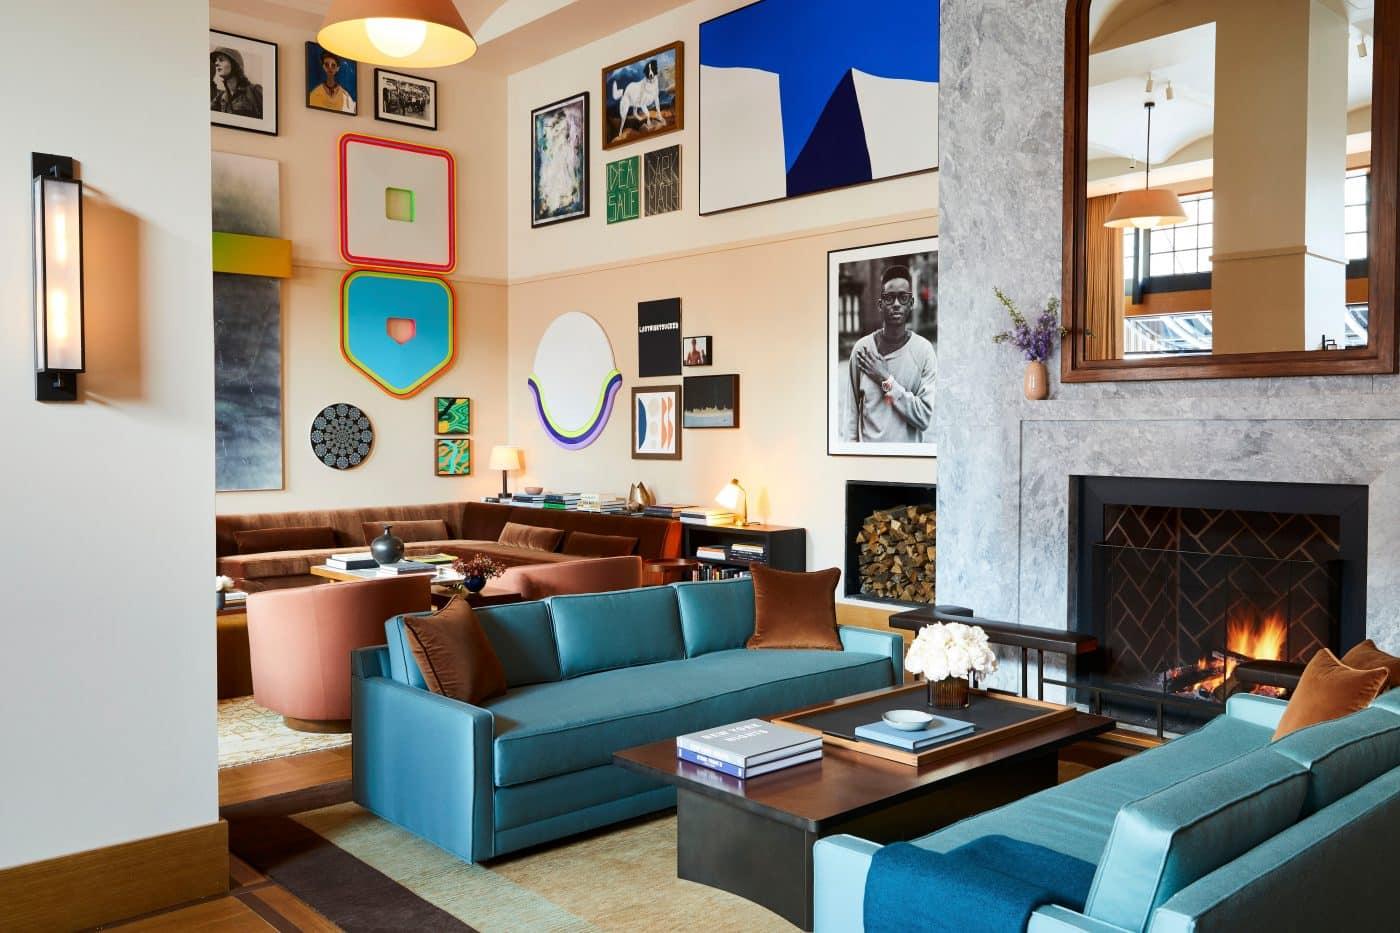 Shinola Hotel lobby in Detroit, designed by Gachot Studios